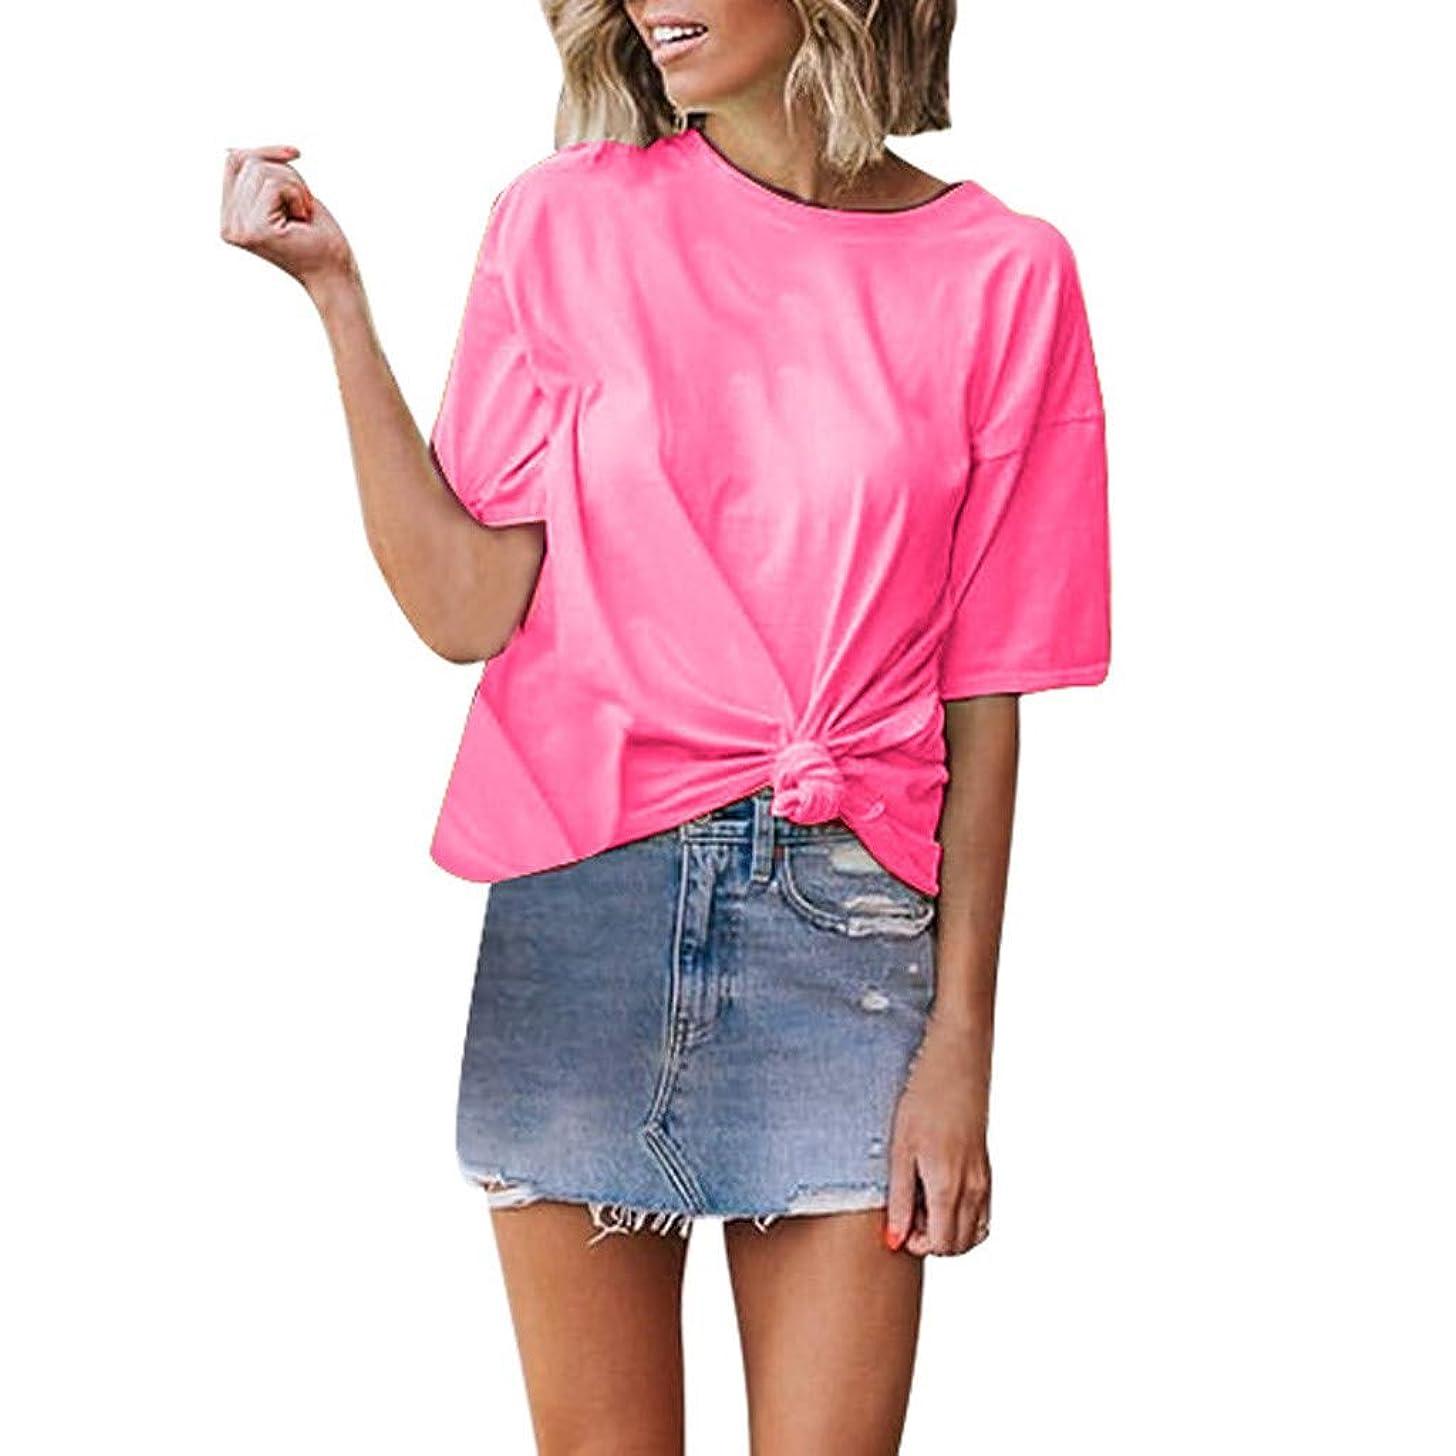 Sttech1 Women T-Shirt Summer Simple Style Solid O-Neck Short Sleeves Top T-Shirt Blouse